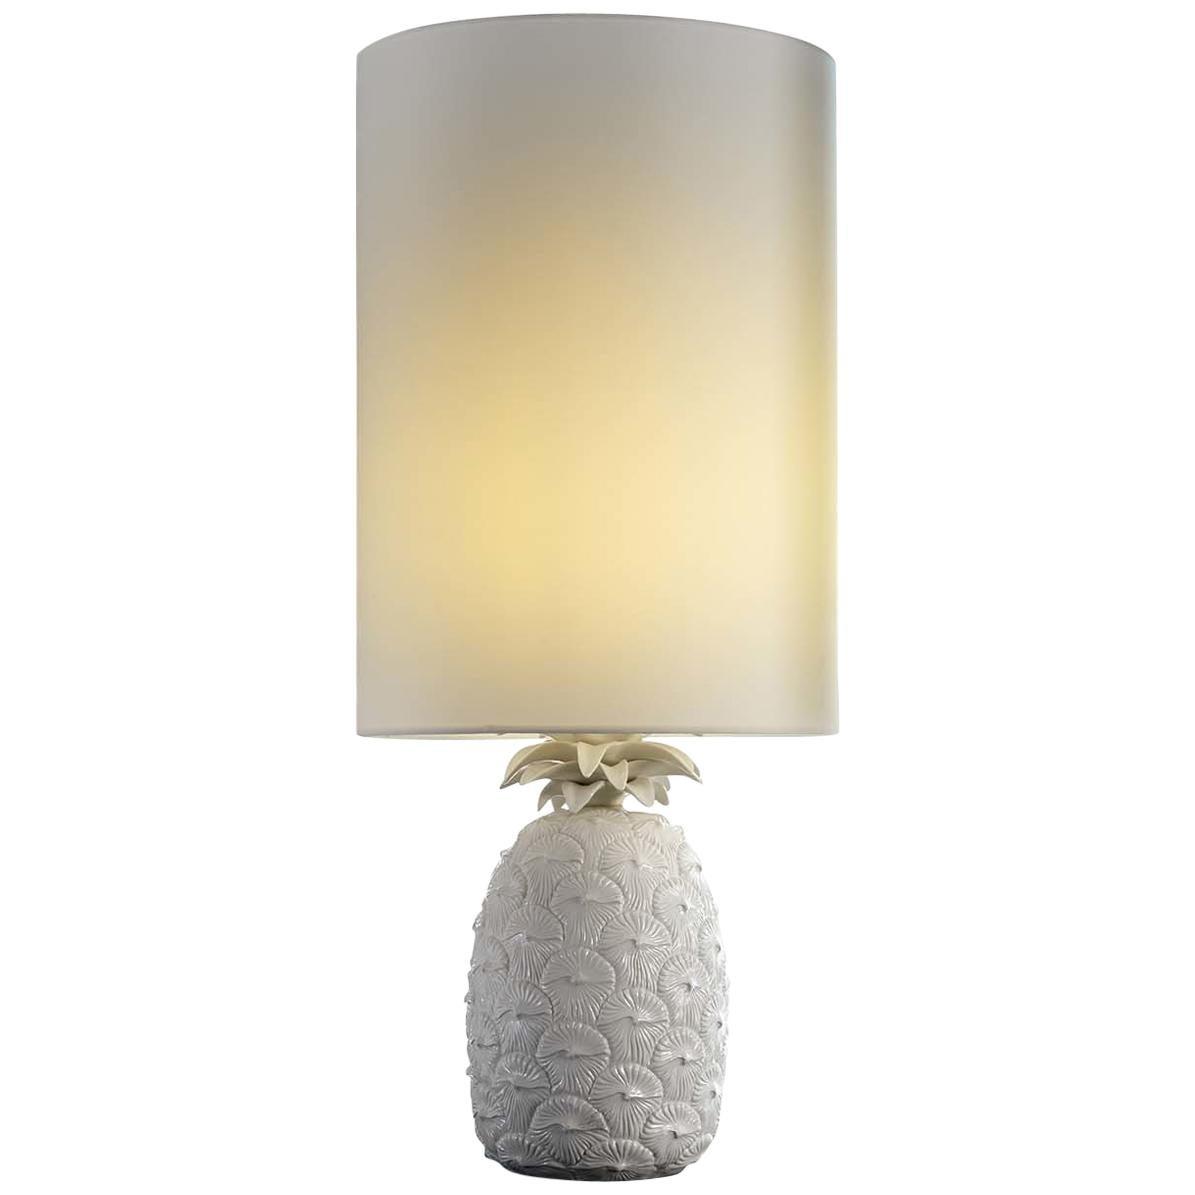 Pineapple Big Table Lamp